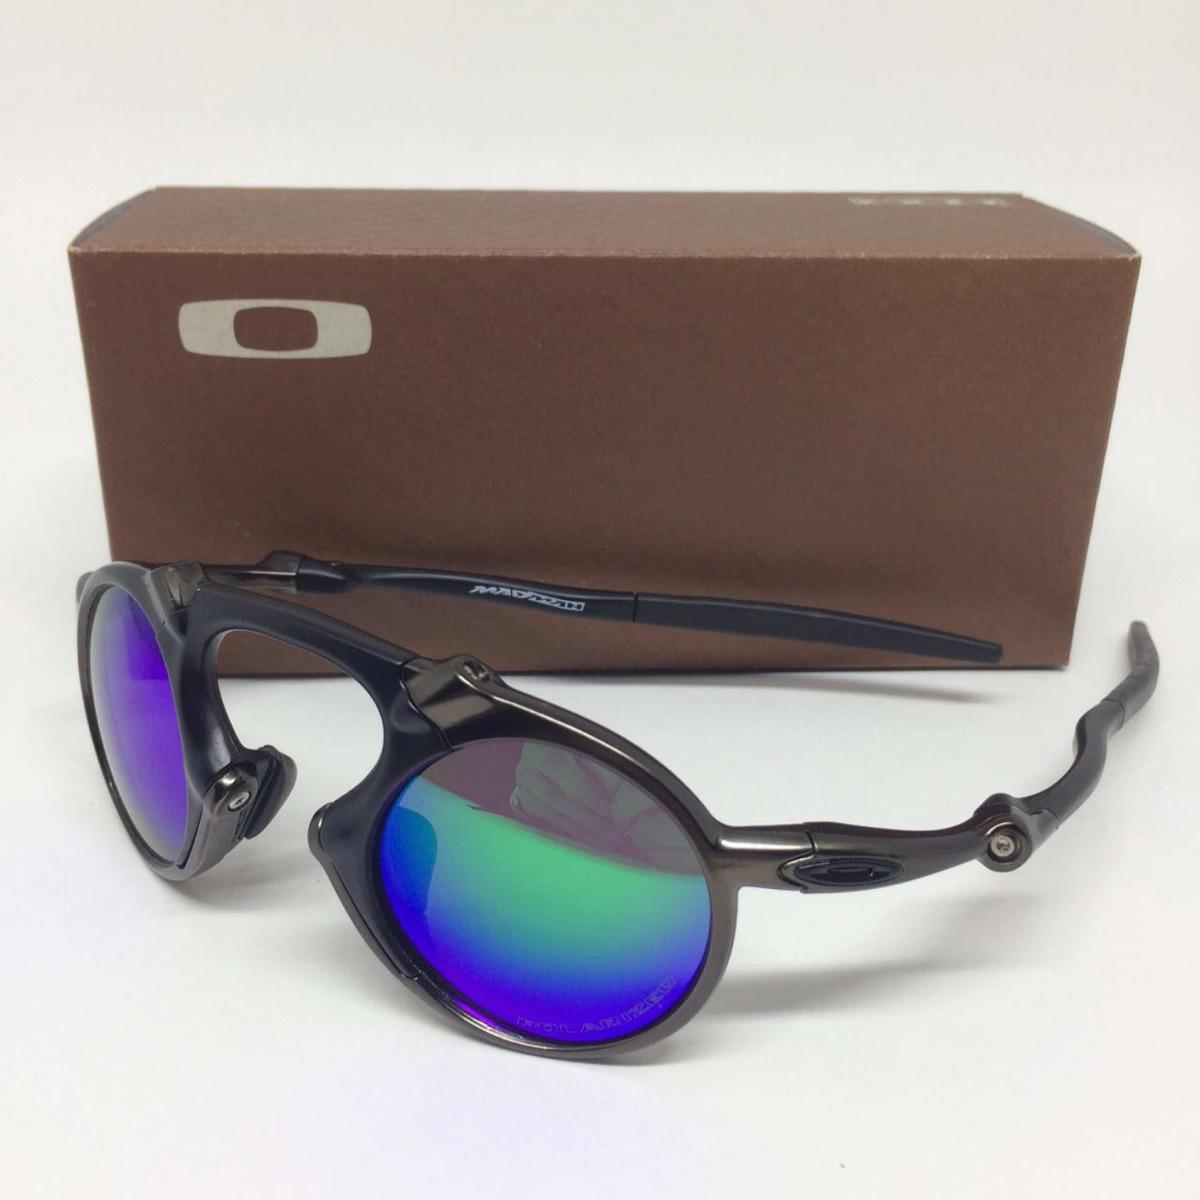 c5ece55c81fea Oculos Oakley Madman Lente Polarizada Verde - R  170,00 em Mercado Livre